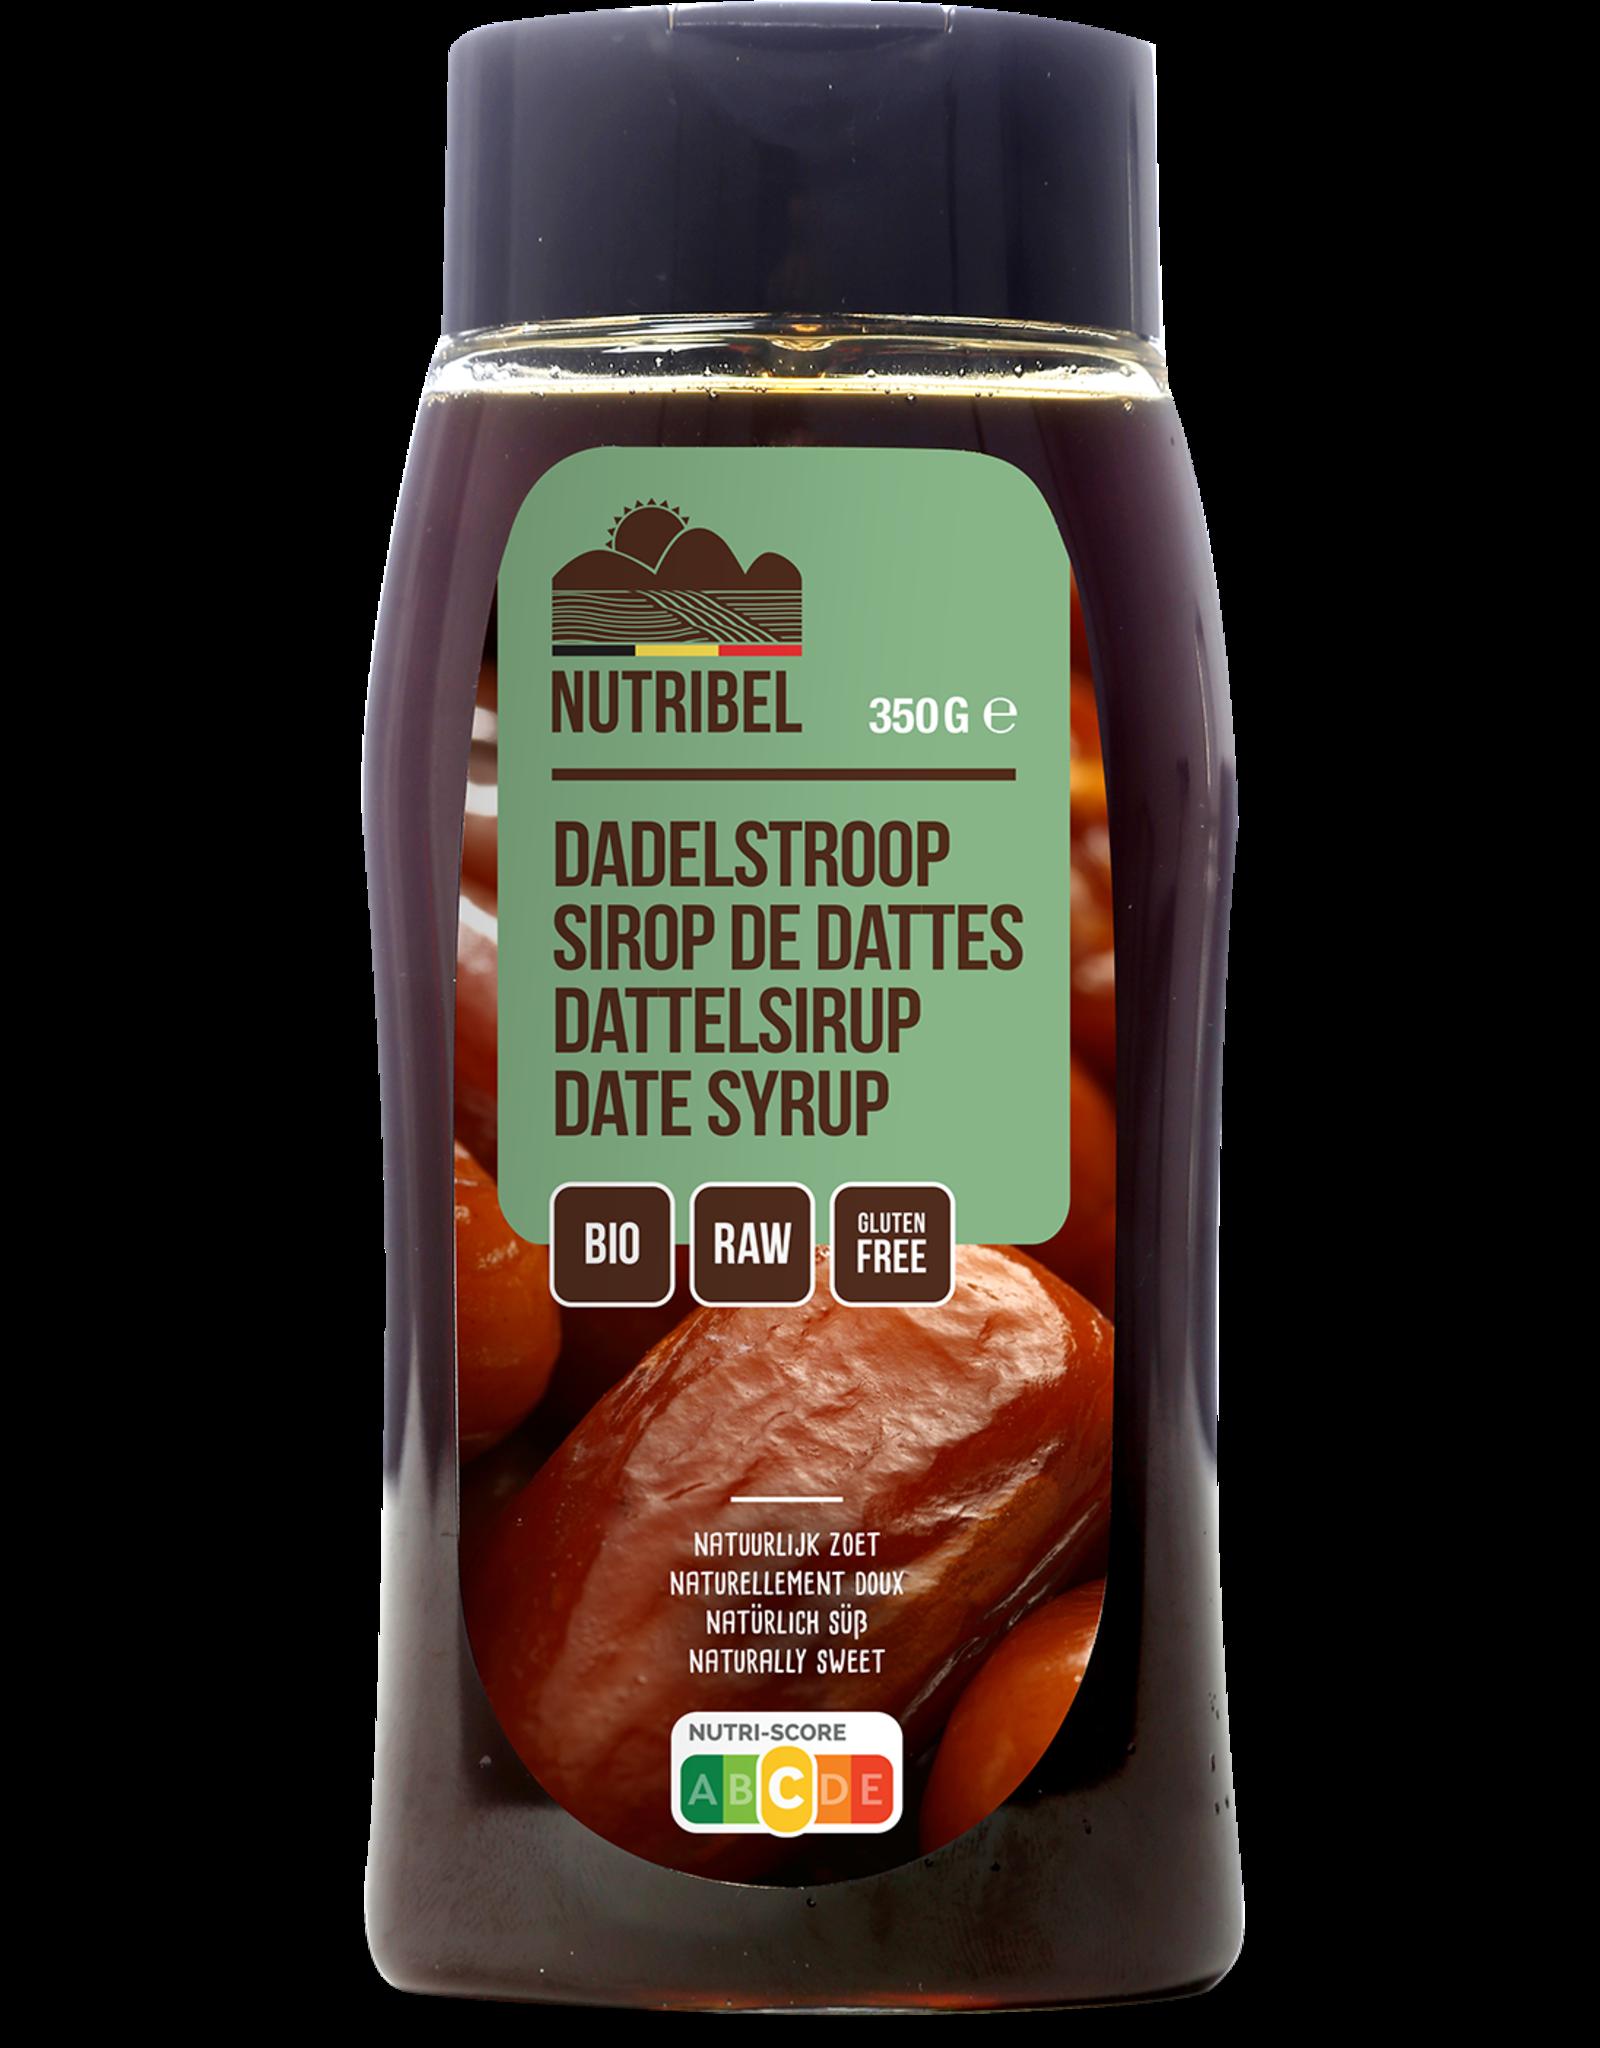 Nutribel Dadelstroop bio 350g